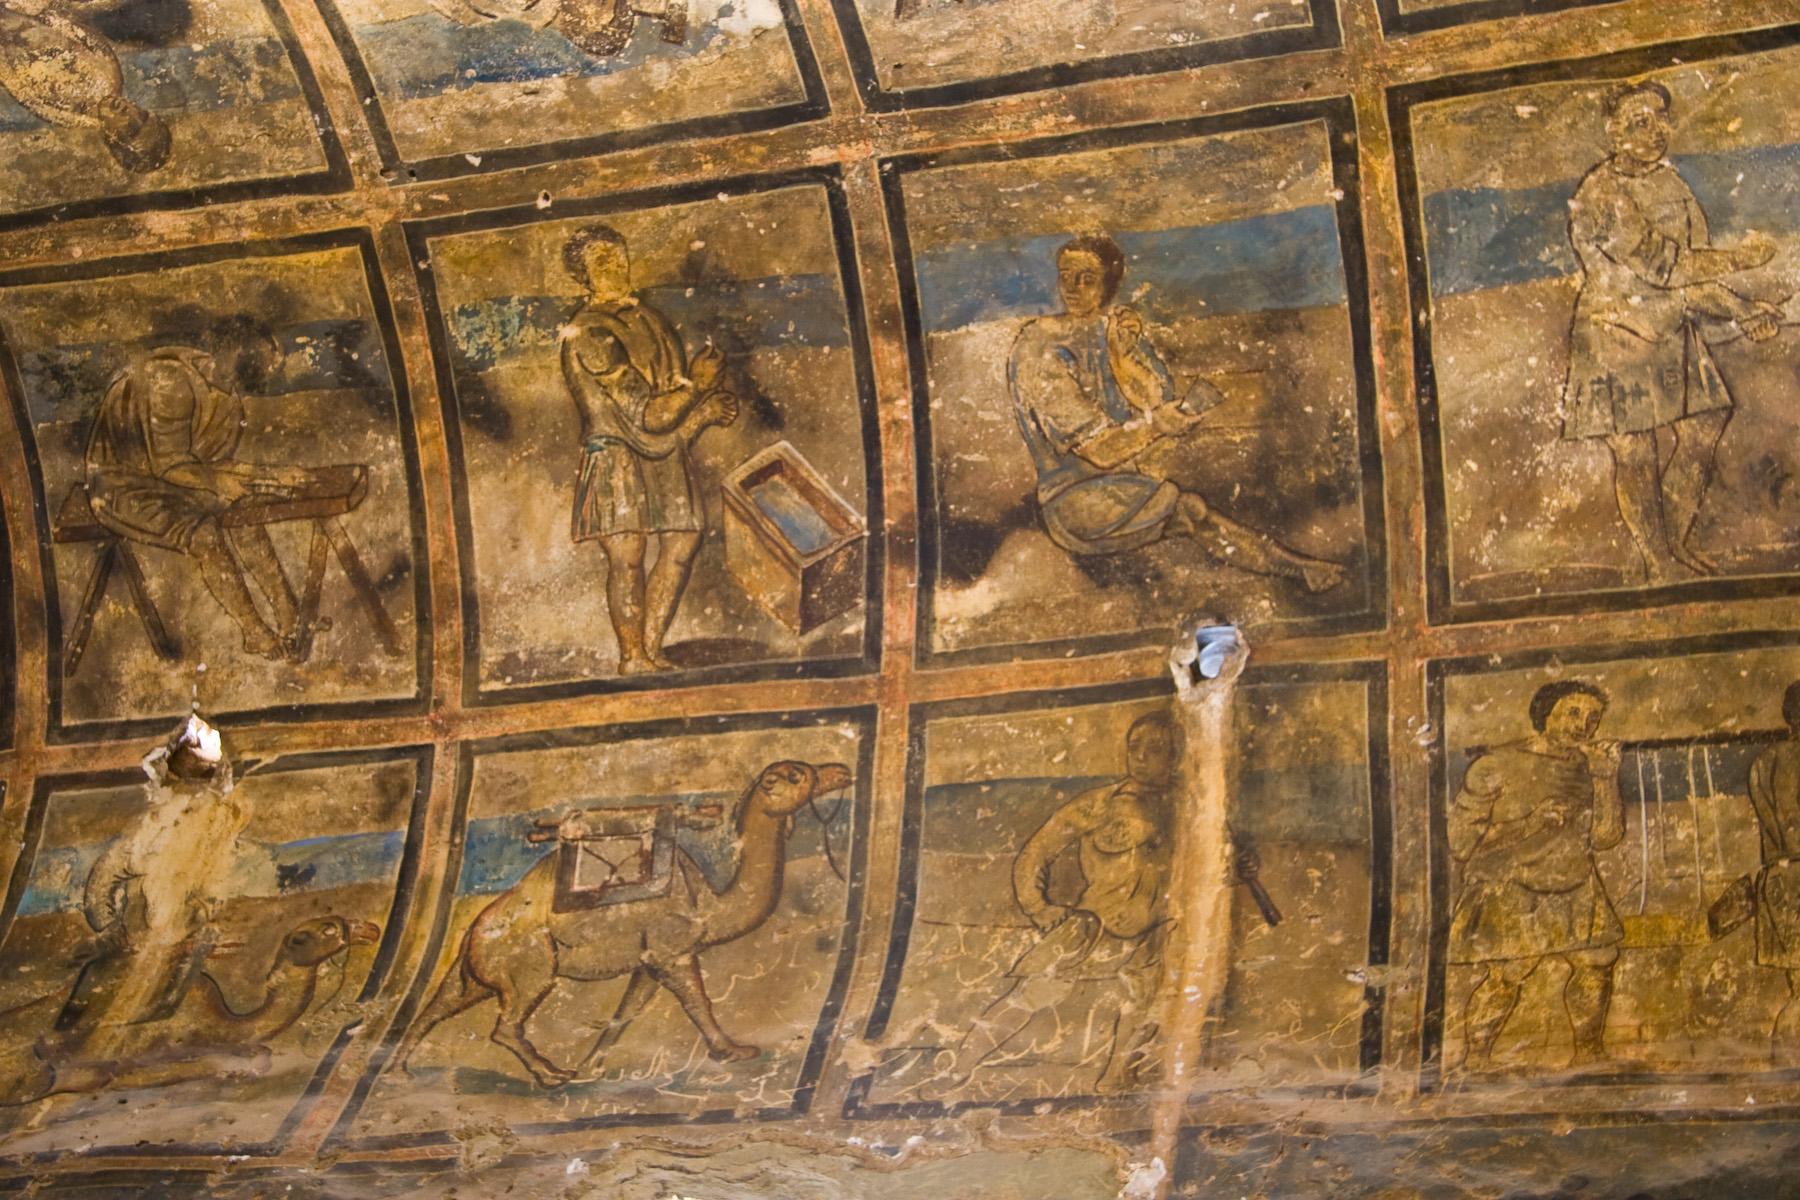 Frescoes inside Qasr Amra. Photo taken by David Bjorgen, distributed under  CC BY-SA 4.0  license.